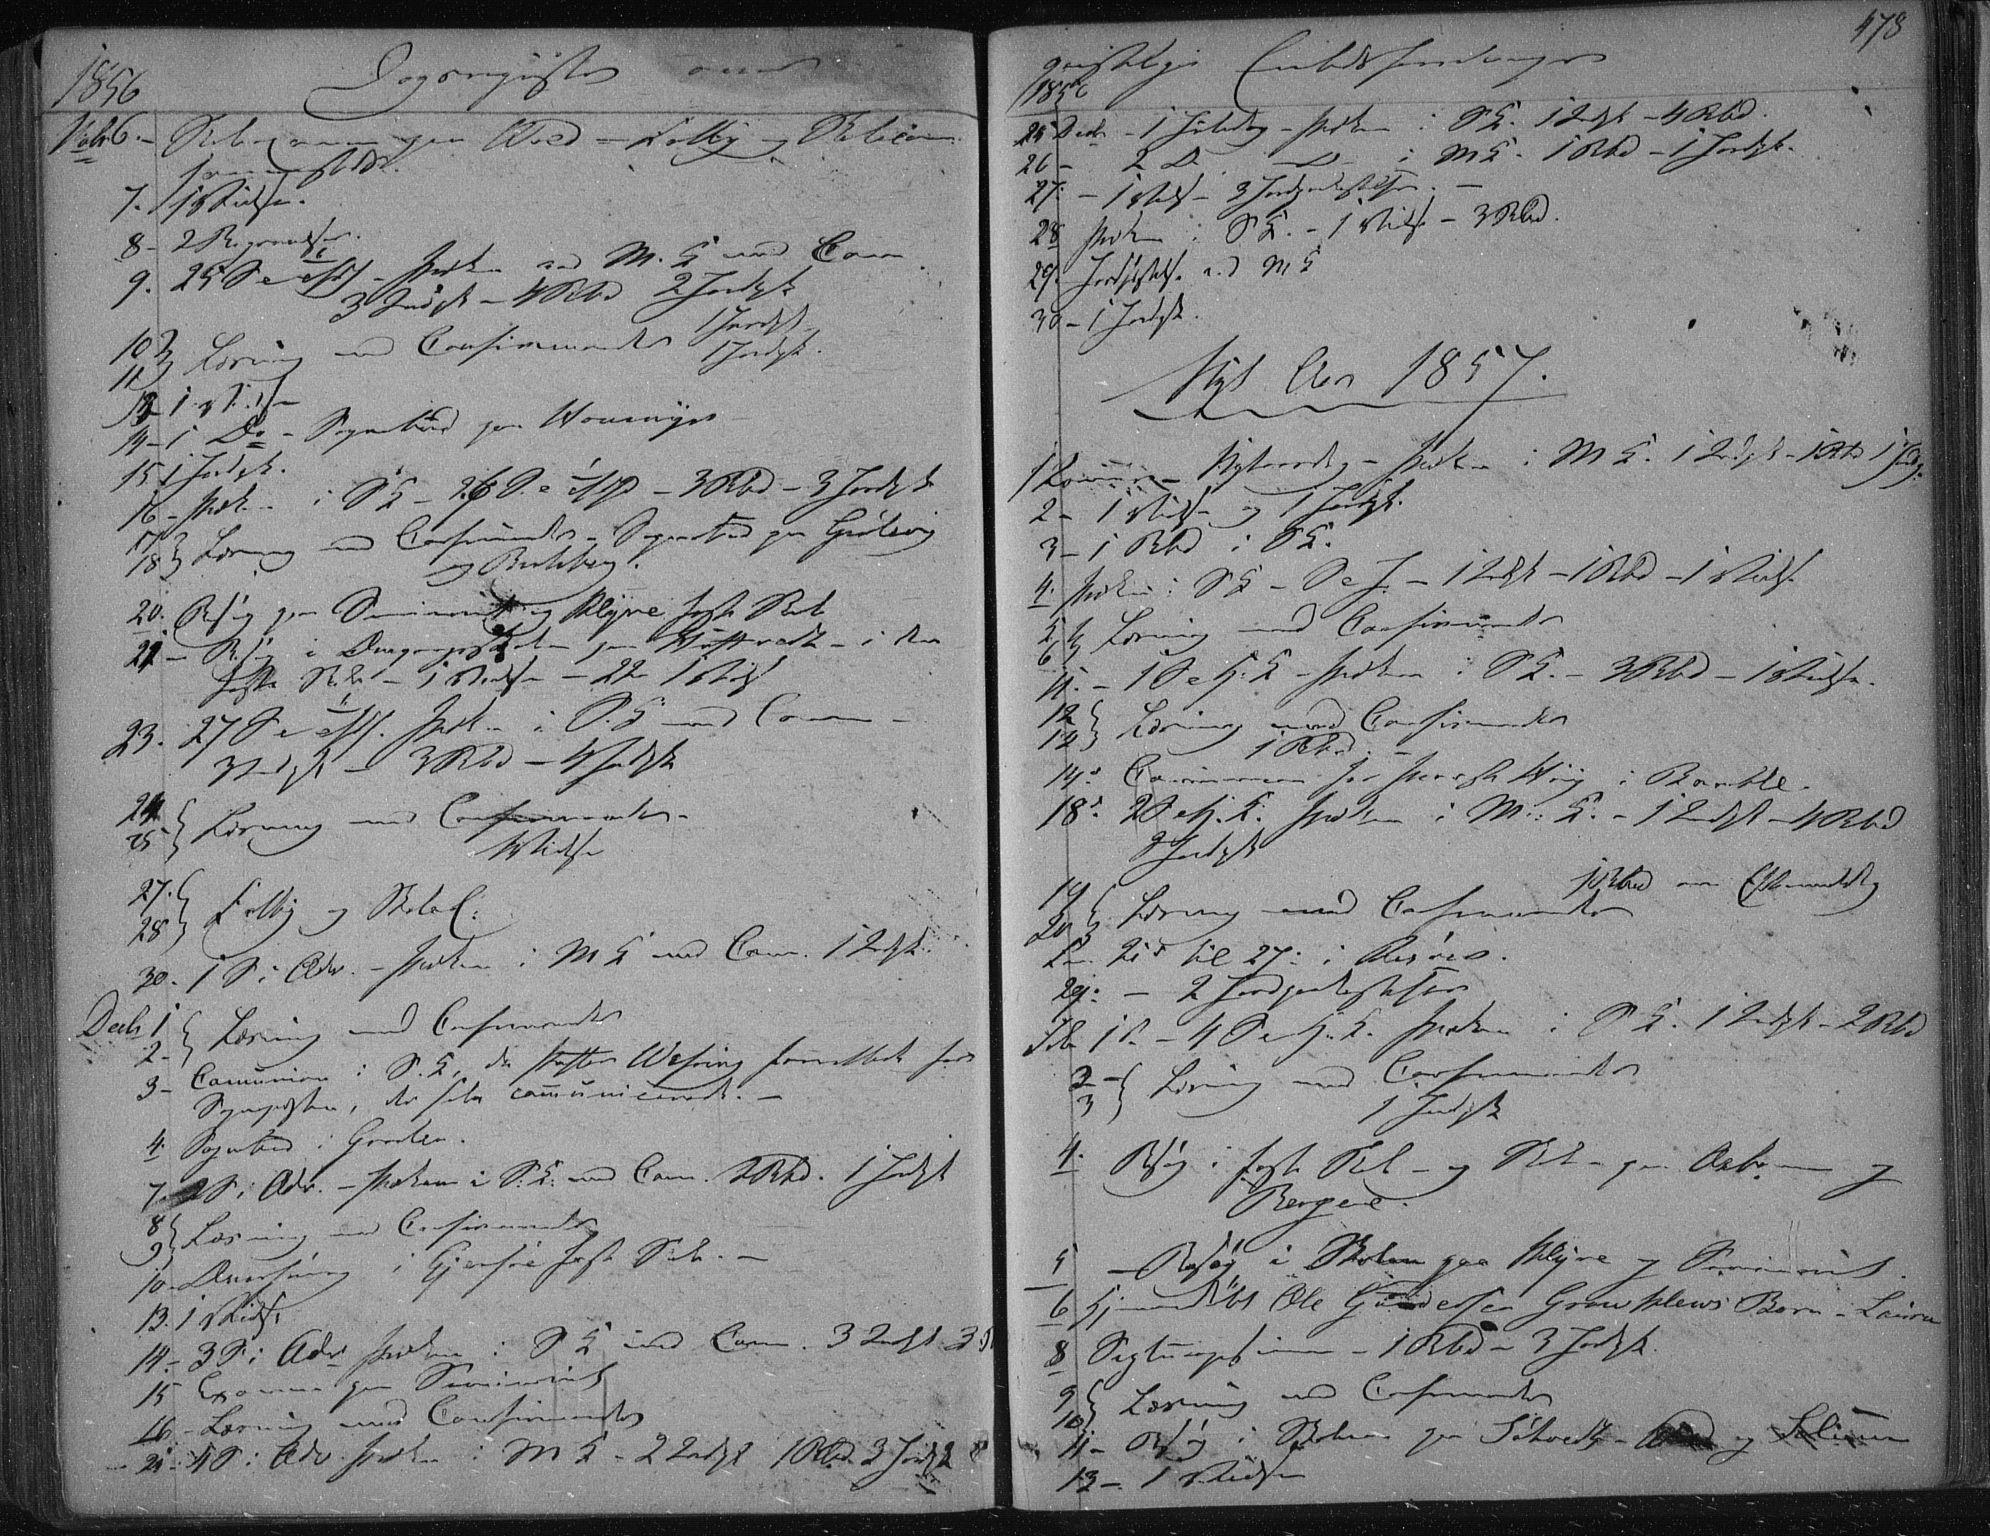 SAKO, Solum kirkebøker, F/Fa/L0007: Ministerialbok nr. I 7, 1856-1864, s. 478